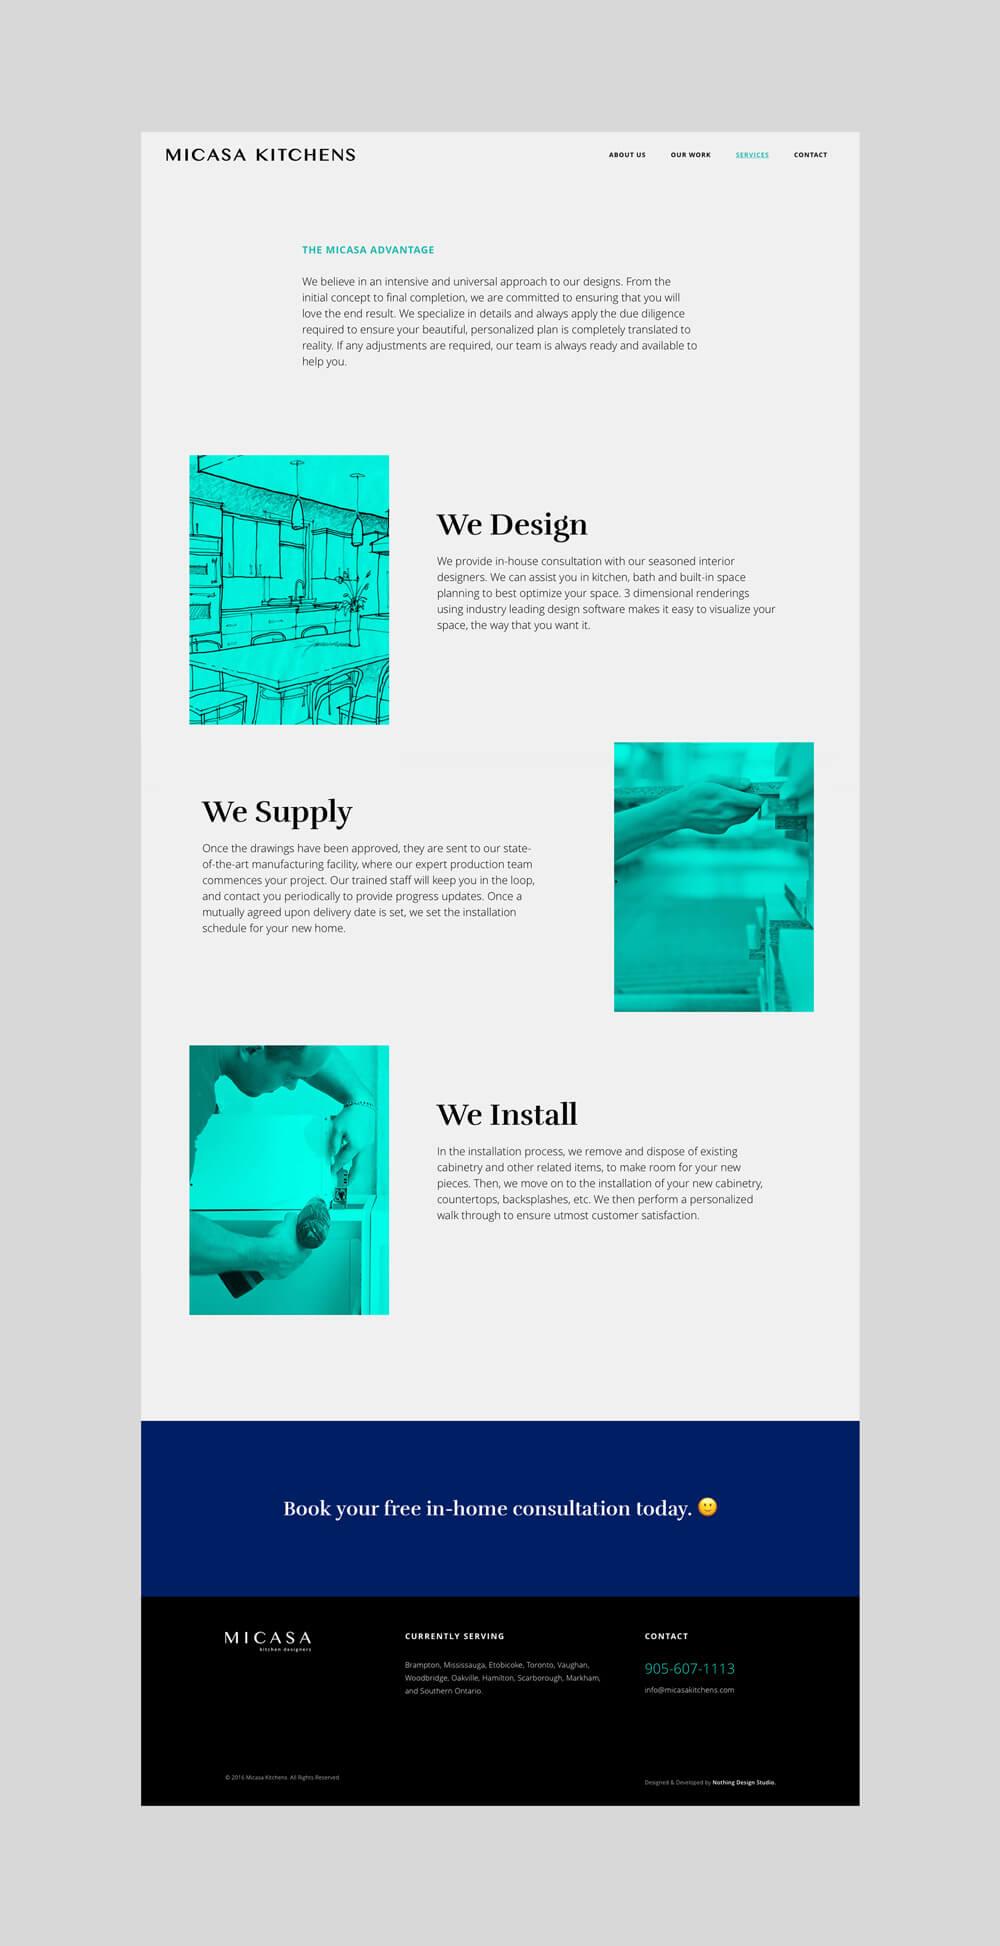 Micasa-website-5